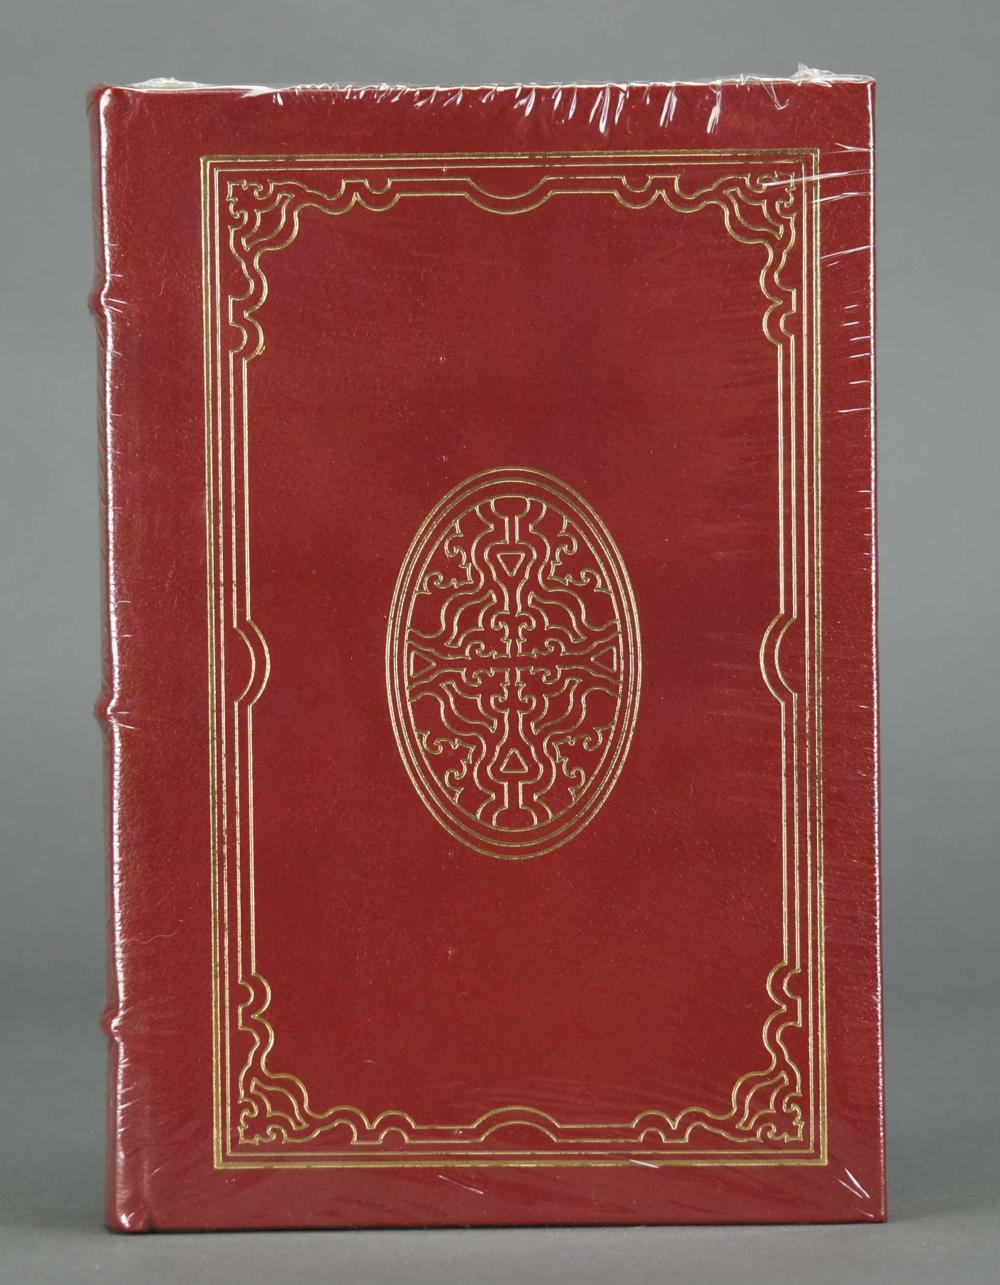 1 vol. Easton Press. Roger Zelazny. Sgd.